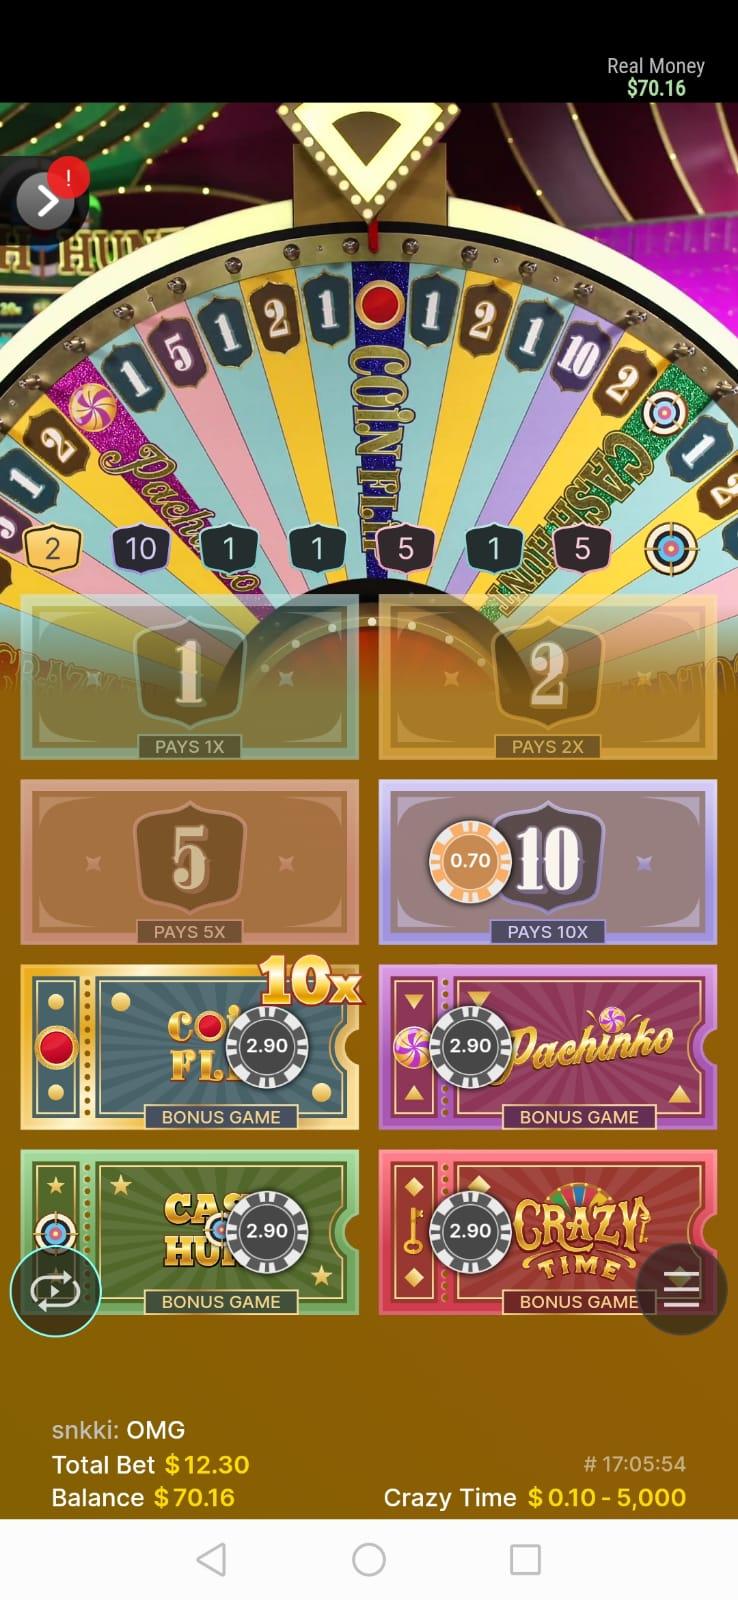 10x Multiplier Coin Flip